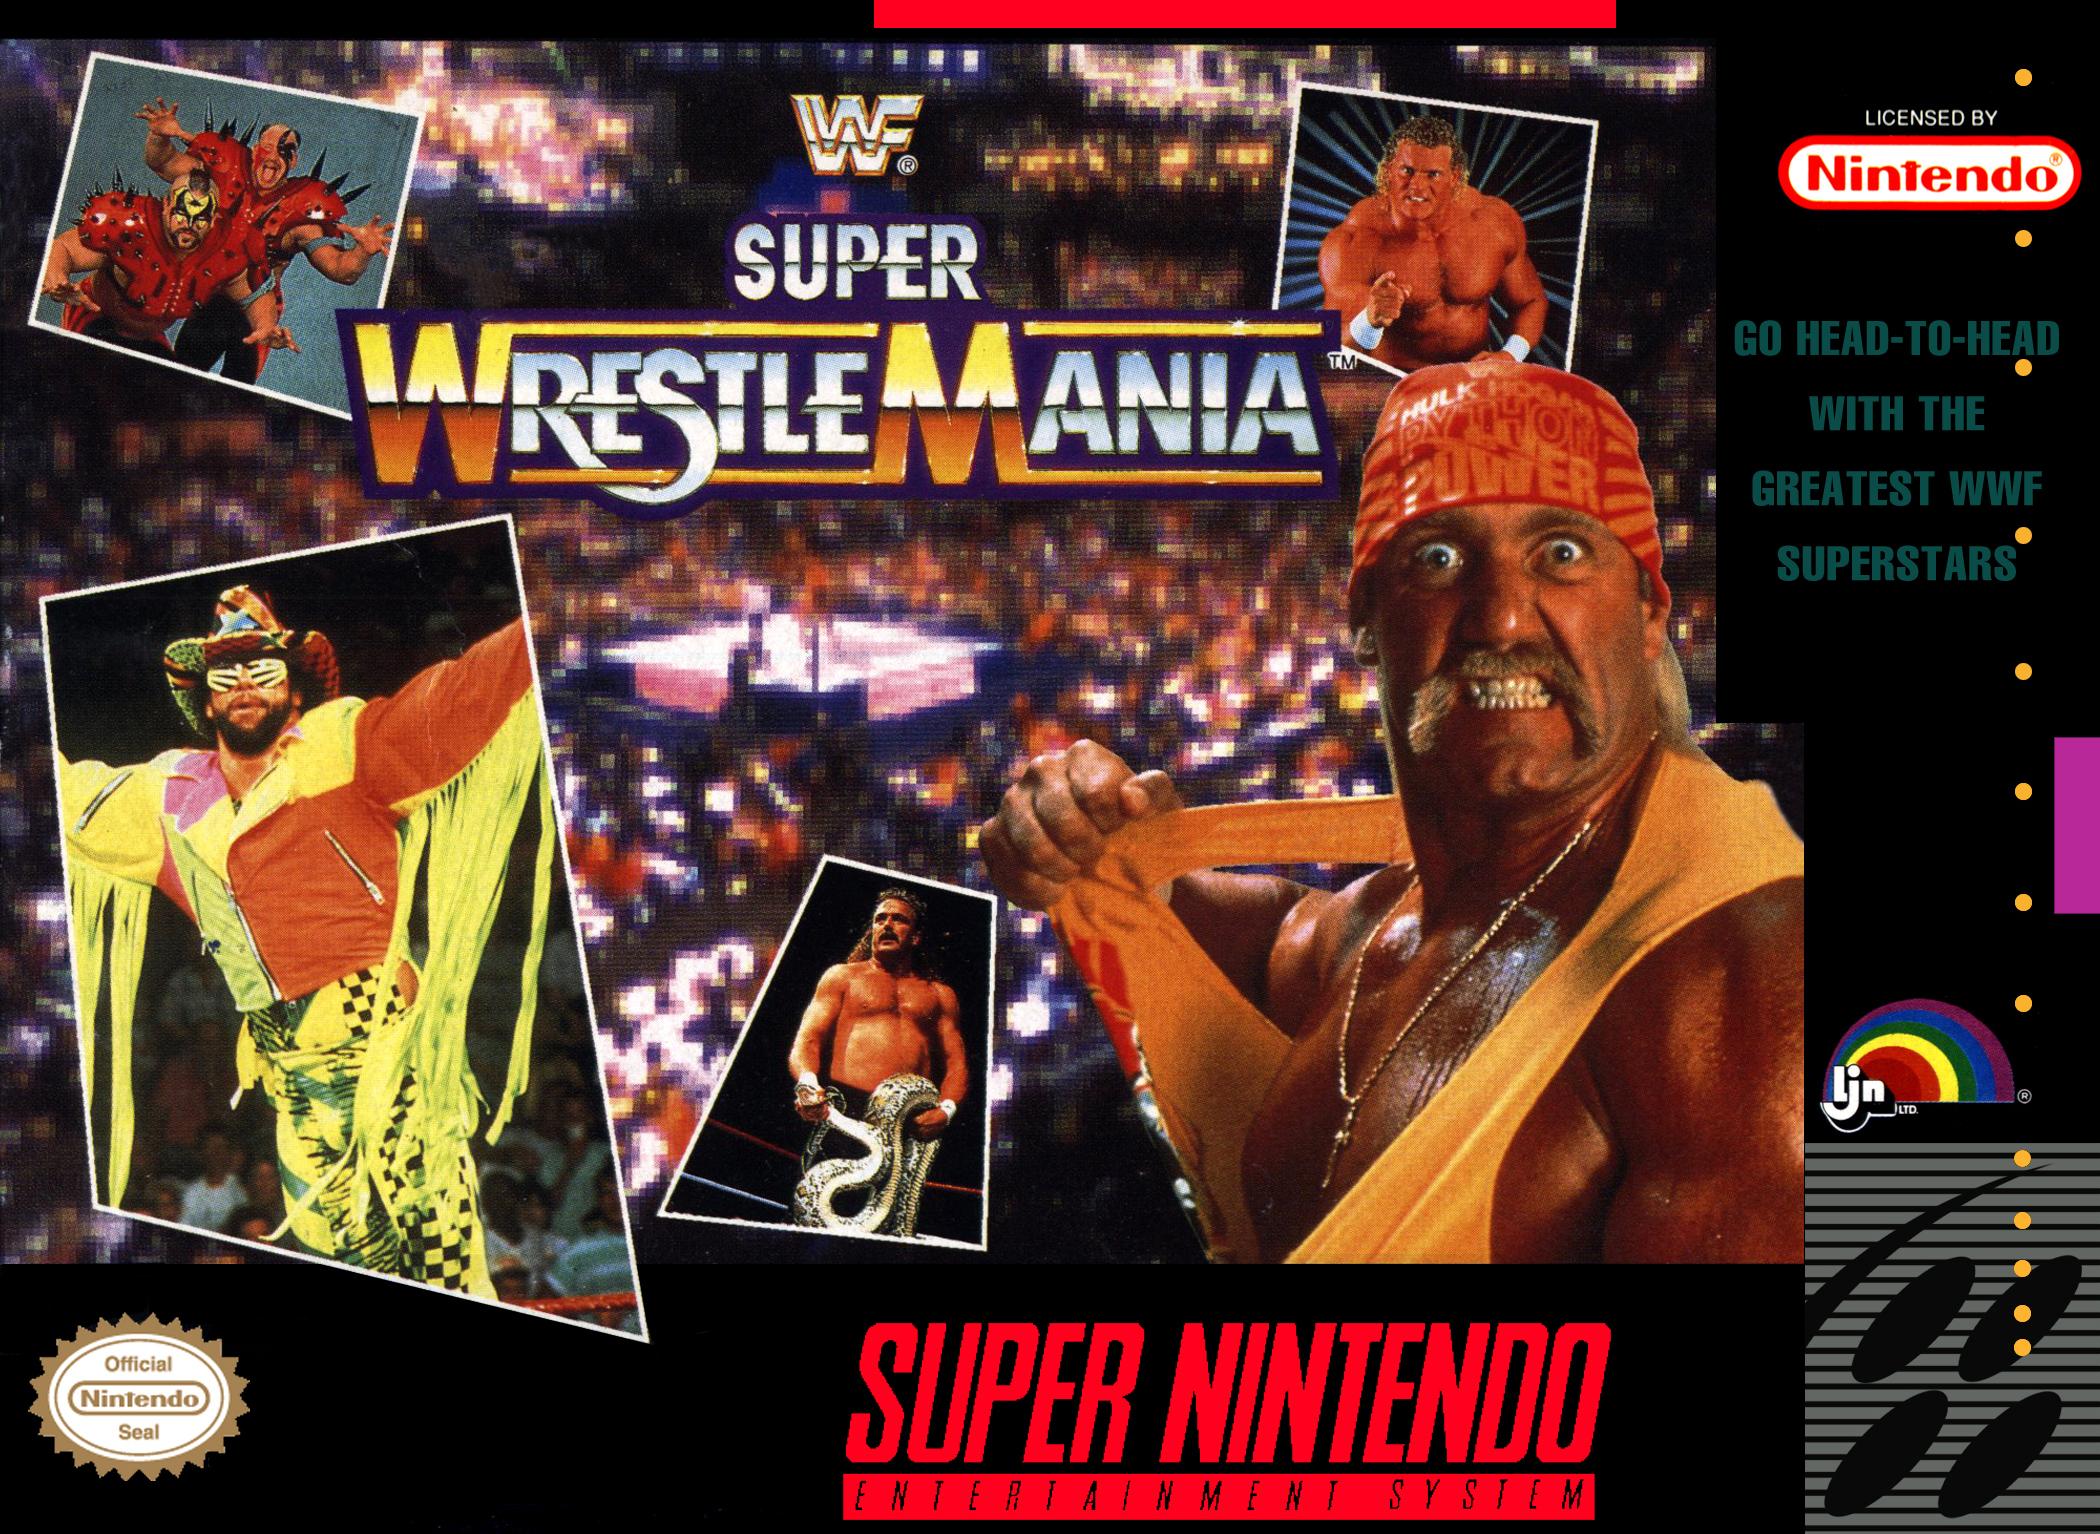 Snes A Day 35 Wwf Super Wrestlemania Snes A Day